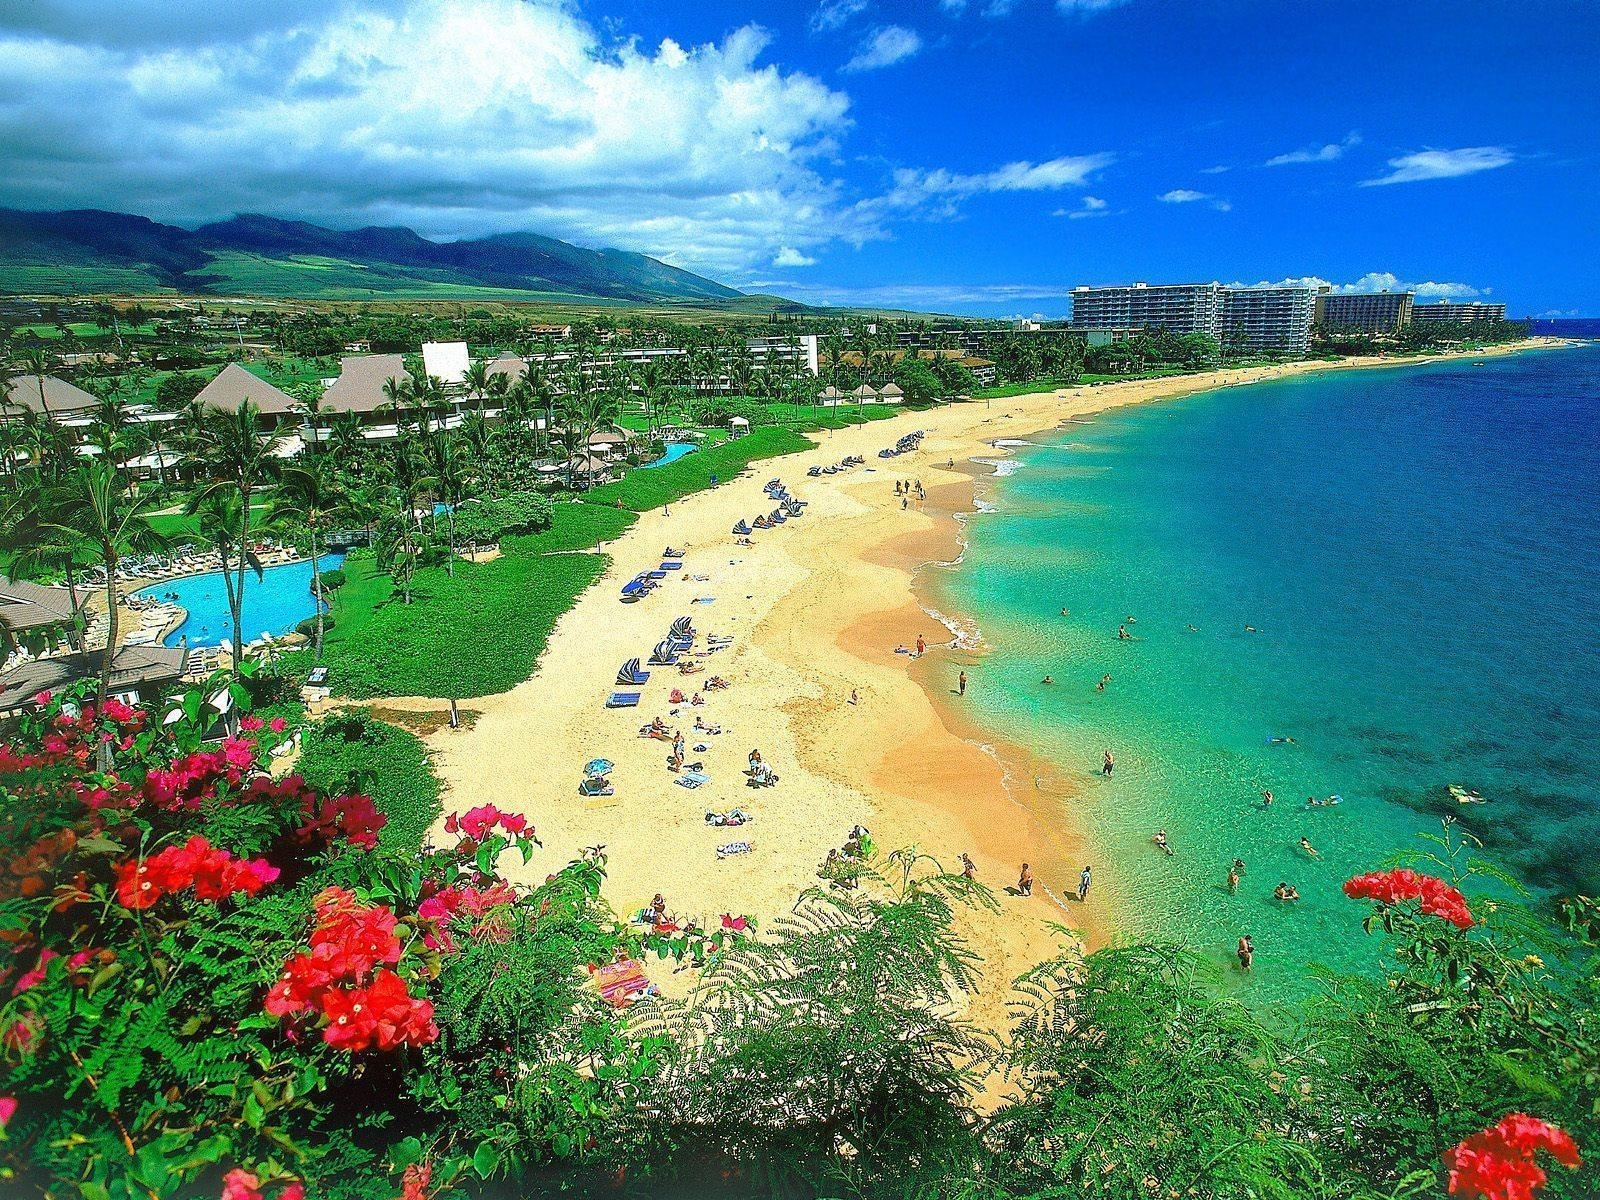 free hawaii desktop wallpapers - wallpaper cave